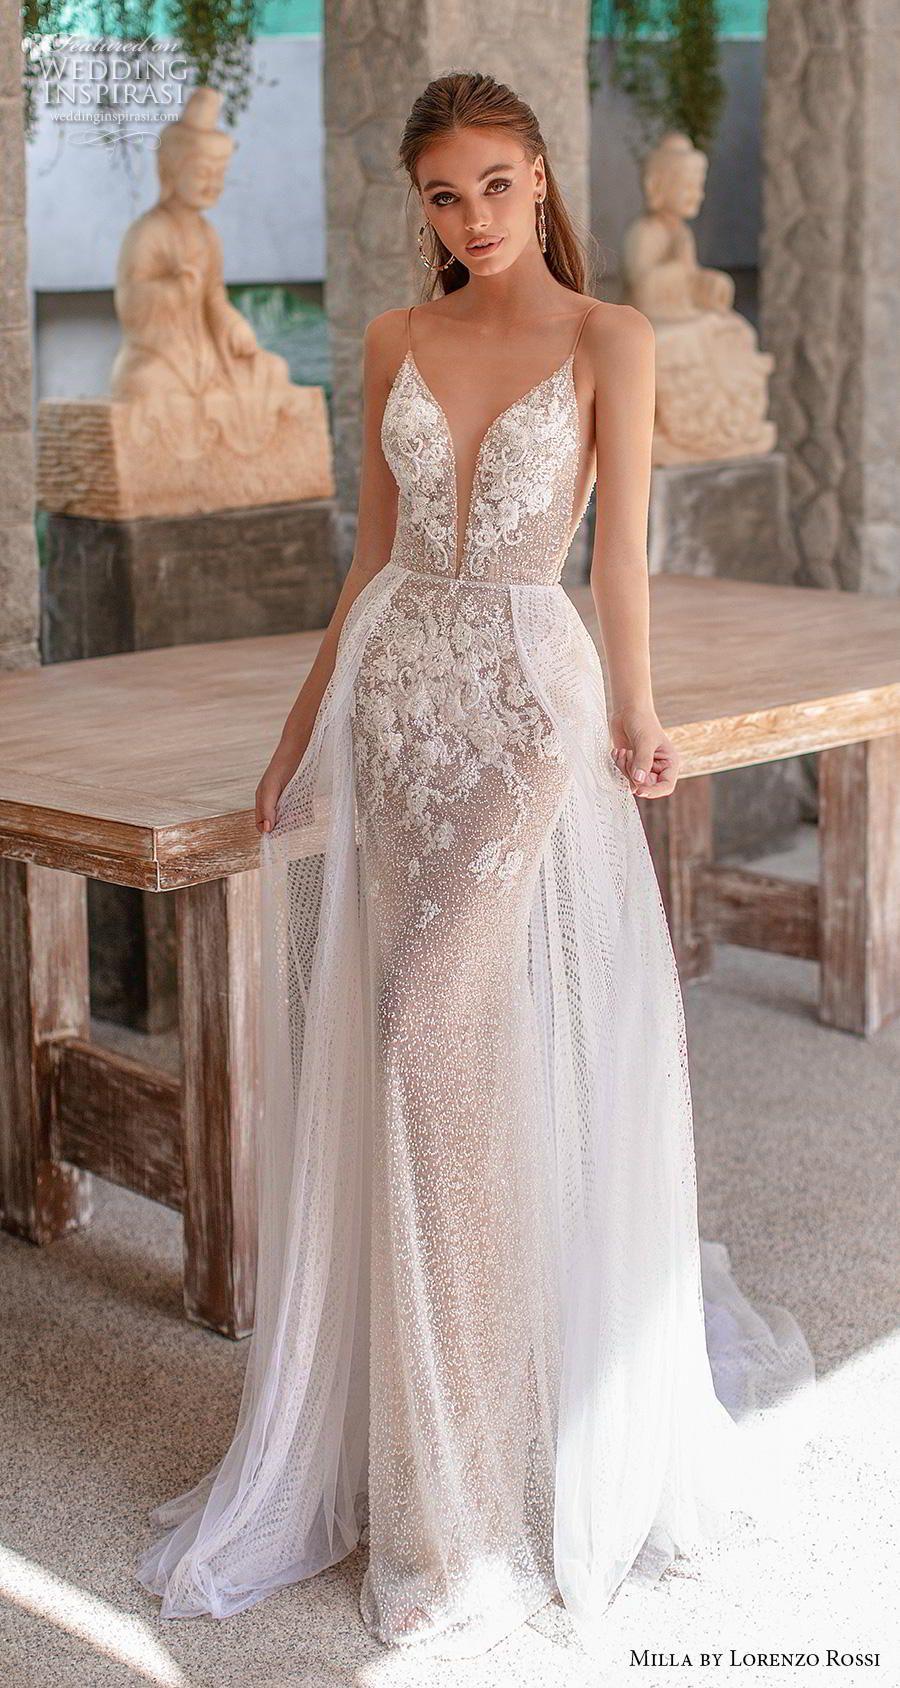 Milla By Lorenzo Rossi 2019 2020 Wedding Dresses Wedding Inspirasi Lace Beach Wedding Dress Milla Nova Wedding Dresses Wedding Dresses Lace